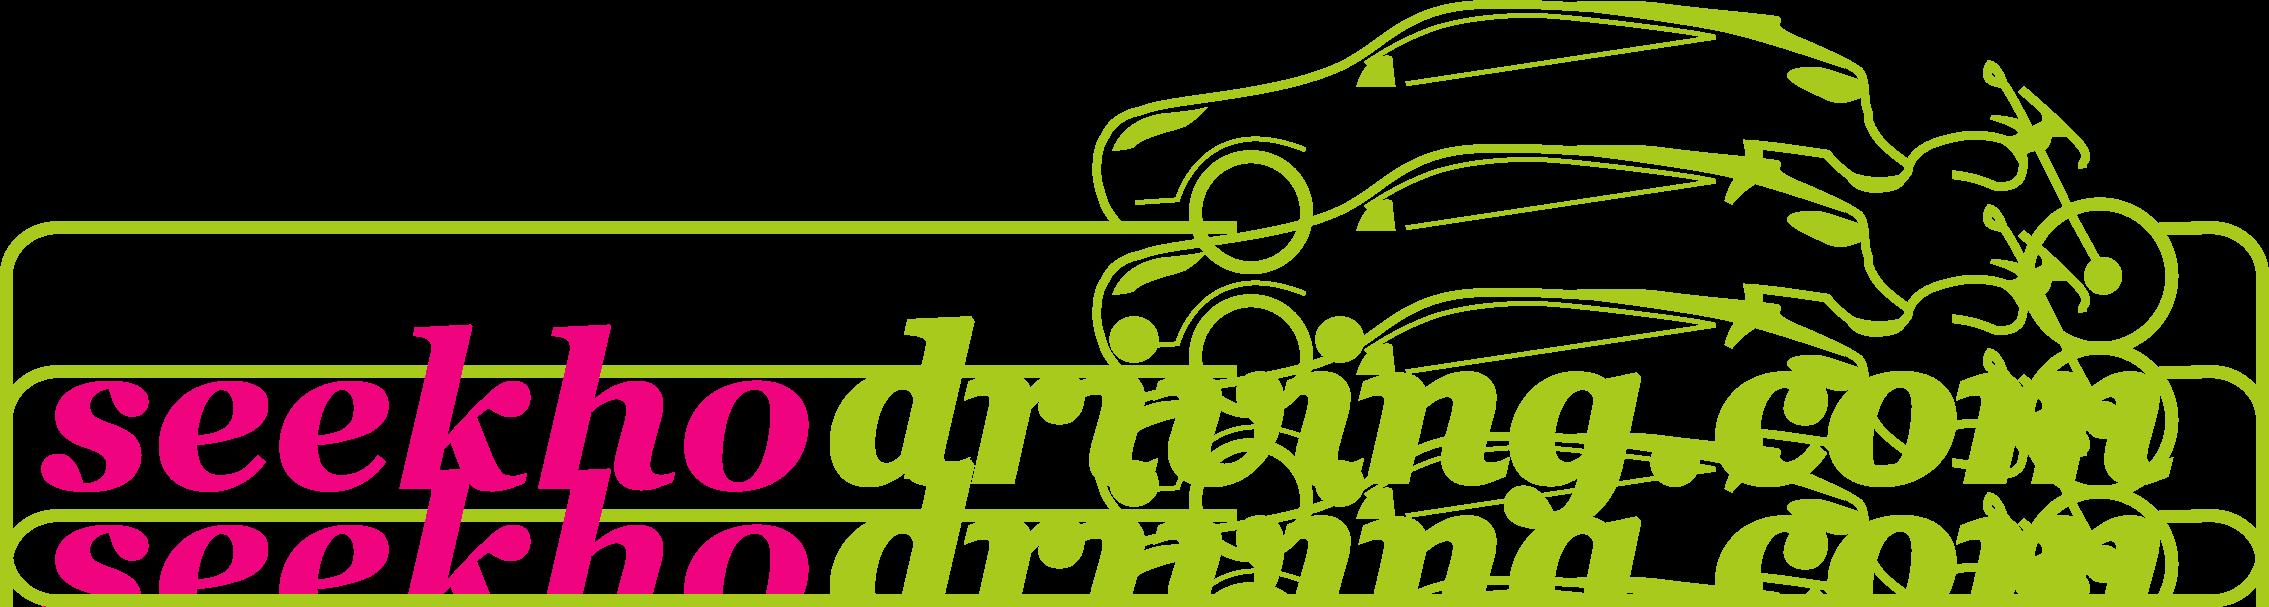 NANDINI MOTOR DRIVING School JAIPUR 8560843330 - seekhodriving.com